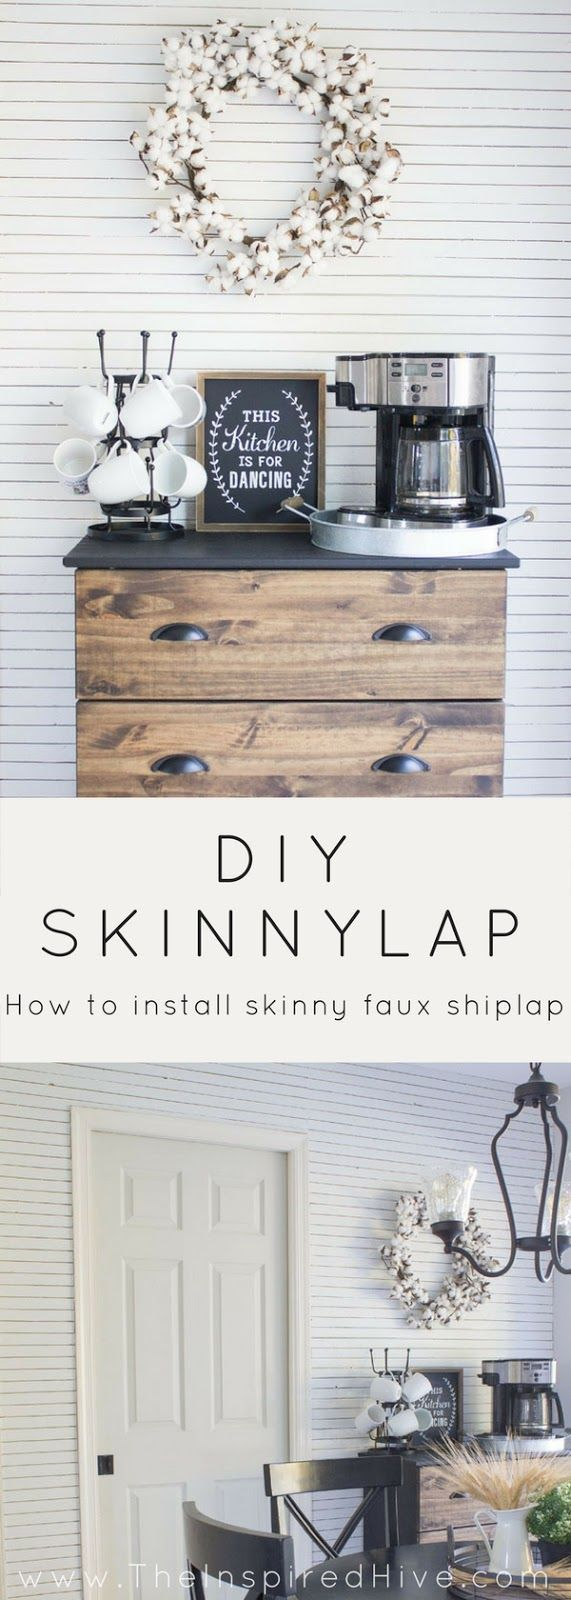 - DIY Skinnylap Feature Wall - #DIY #feature #shiplap #Skinnylap